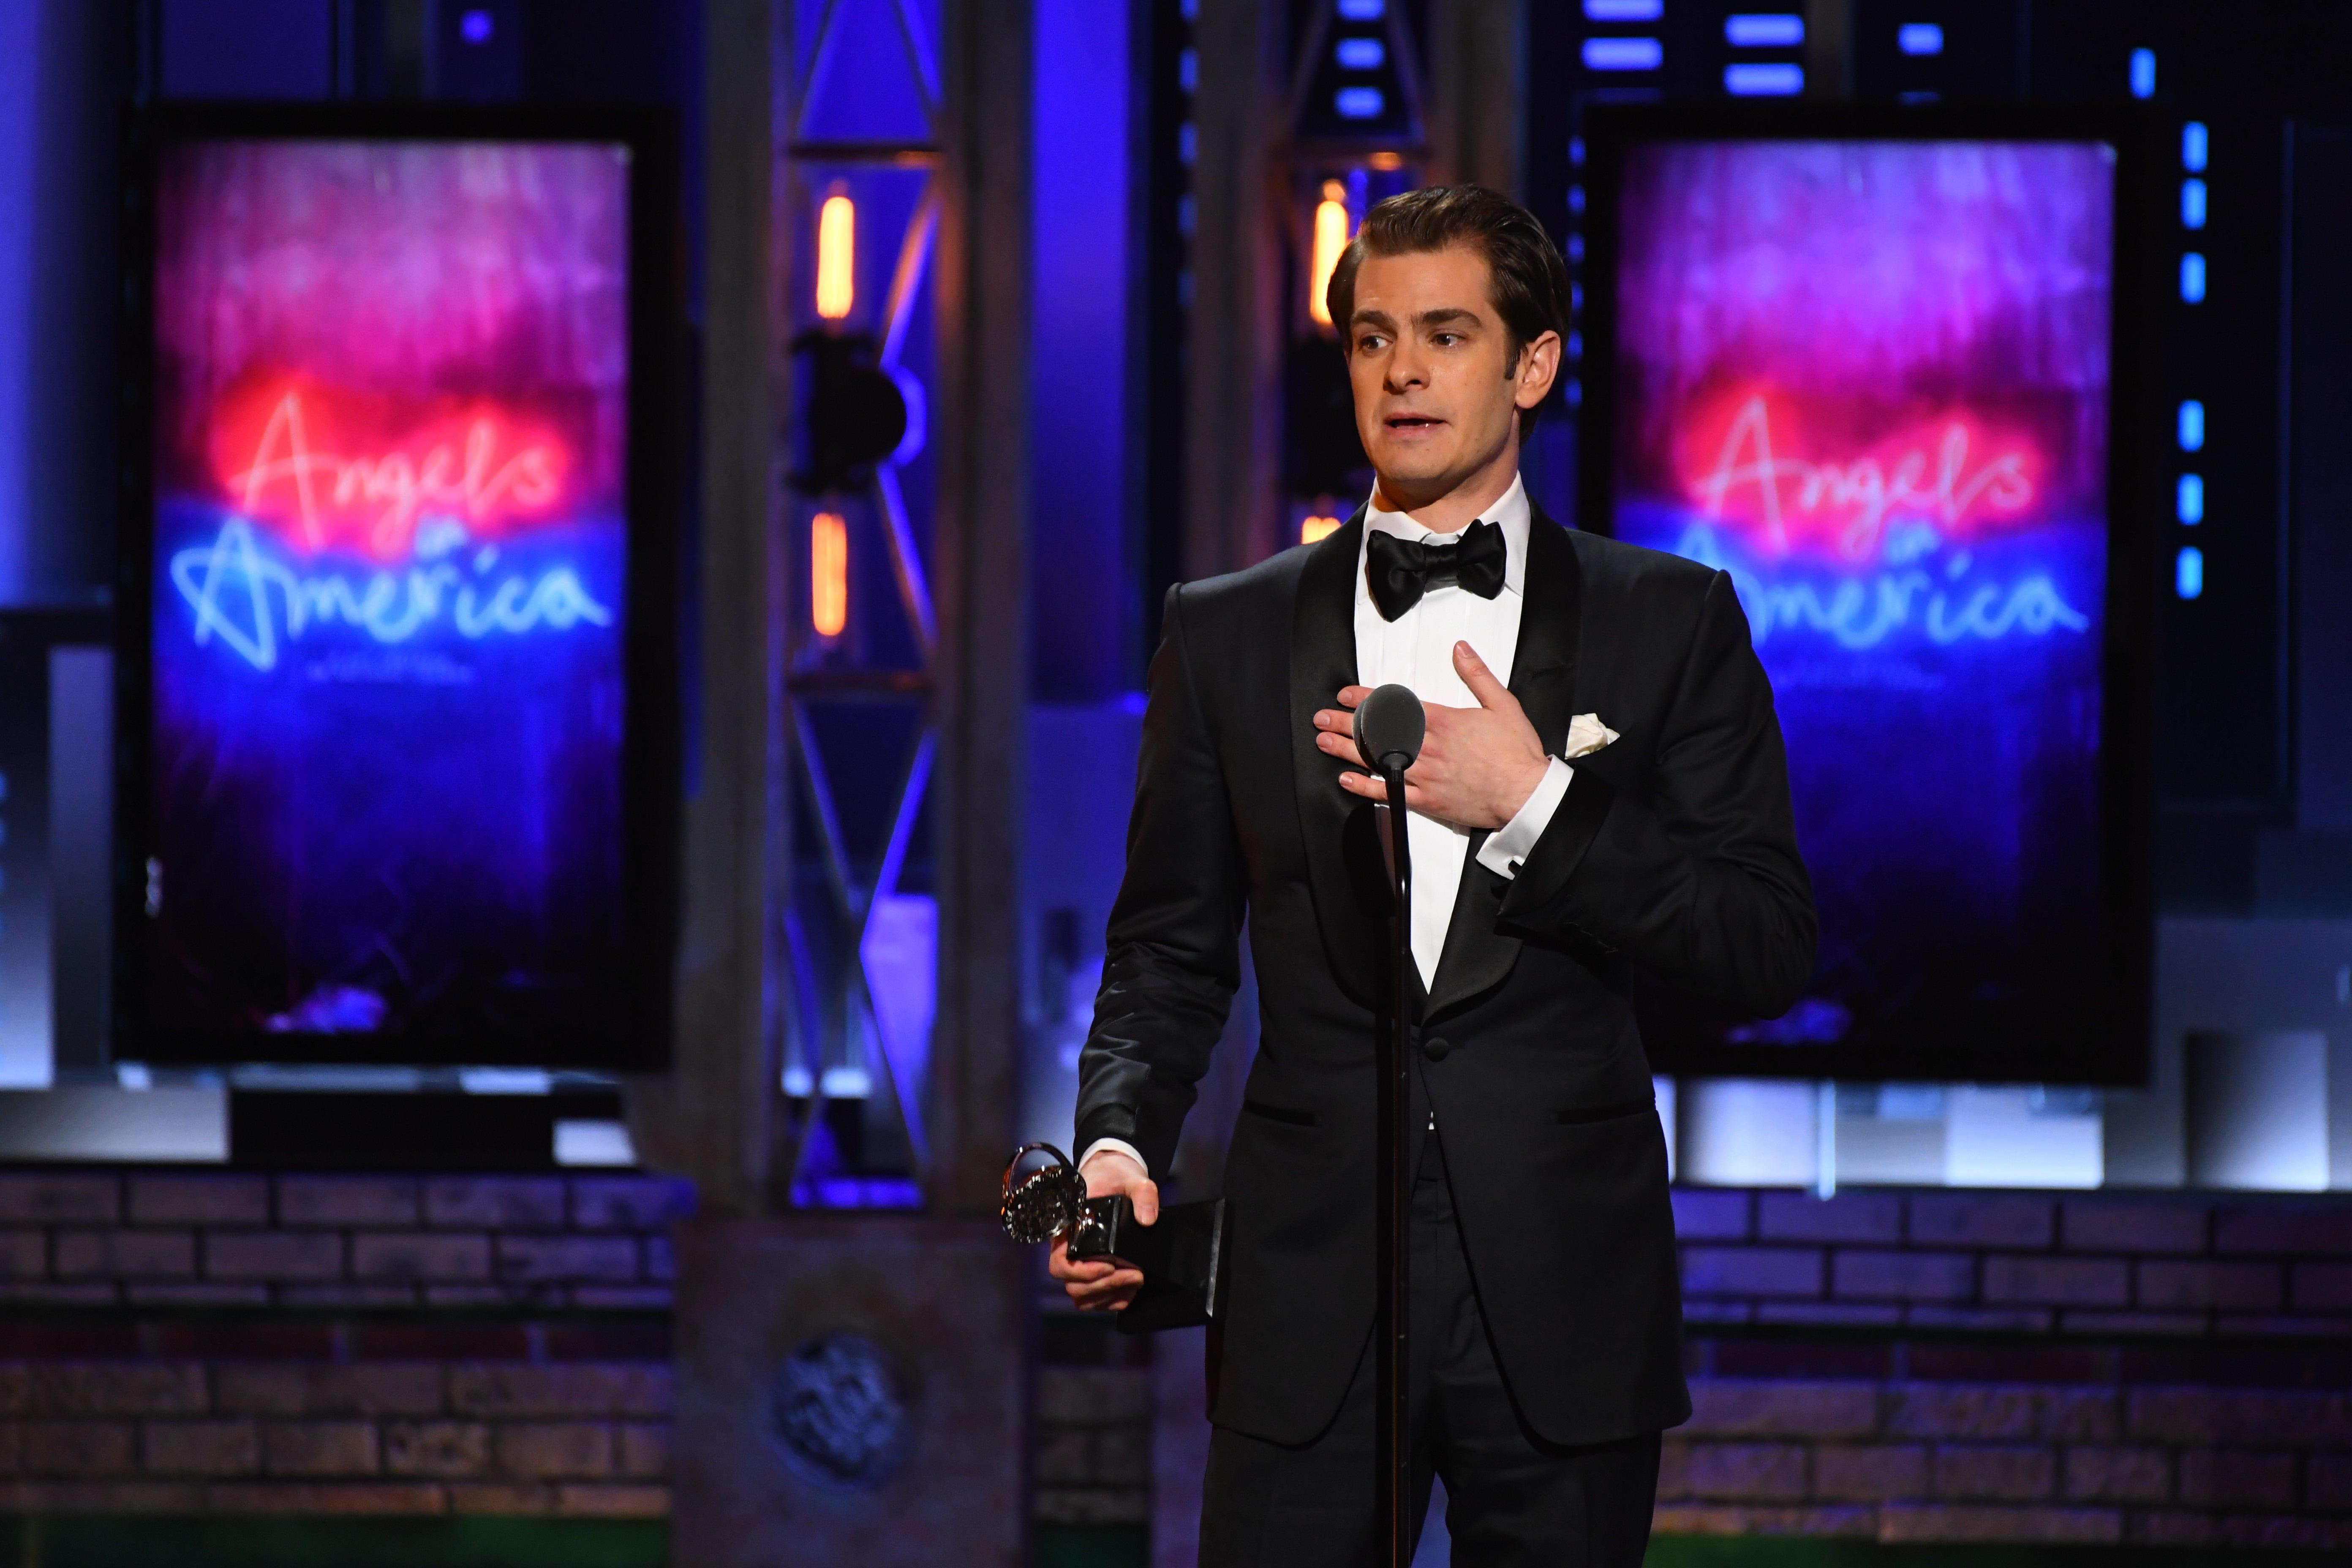 Tony Awards: Andrew Garfield emphasizes 'sanctity of the human spirit' in powerful speech